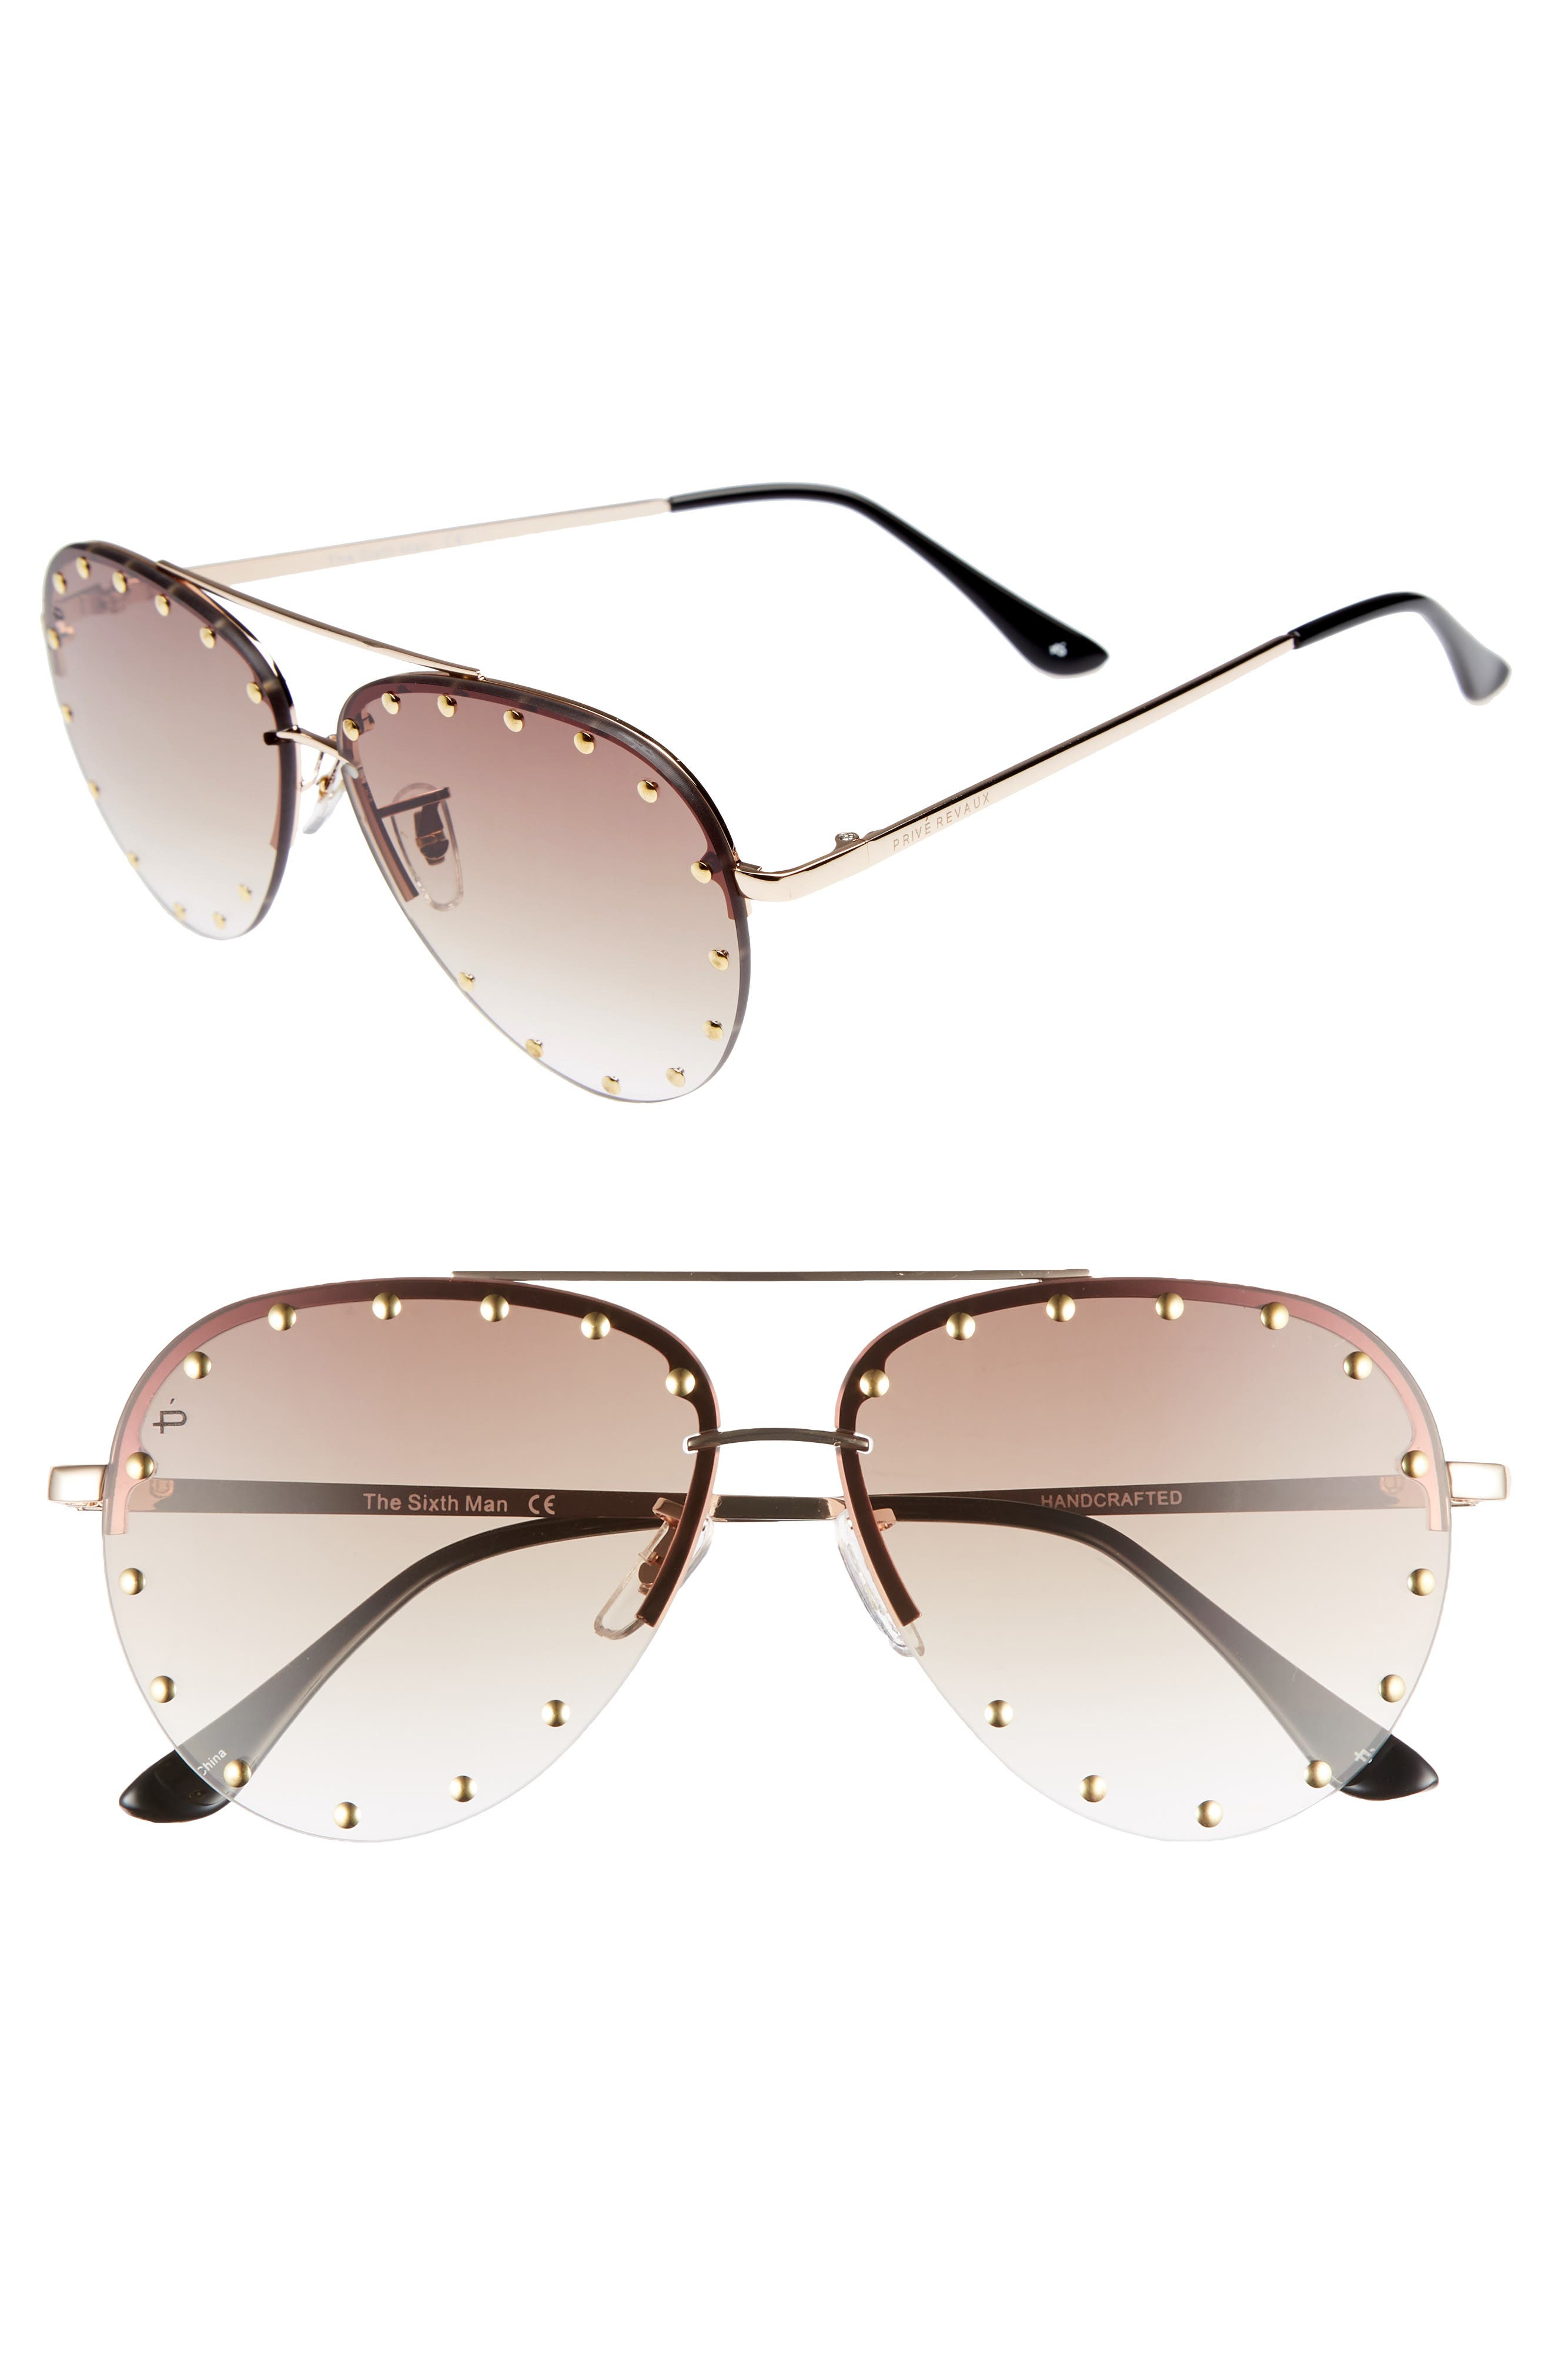 Privé Revaux The Sixth Man 60mm Studded Aviator Sunglasses,                             Main thumbnail 2, color,